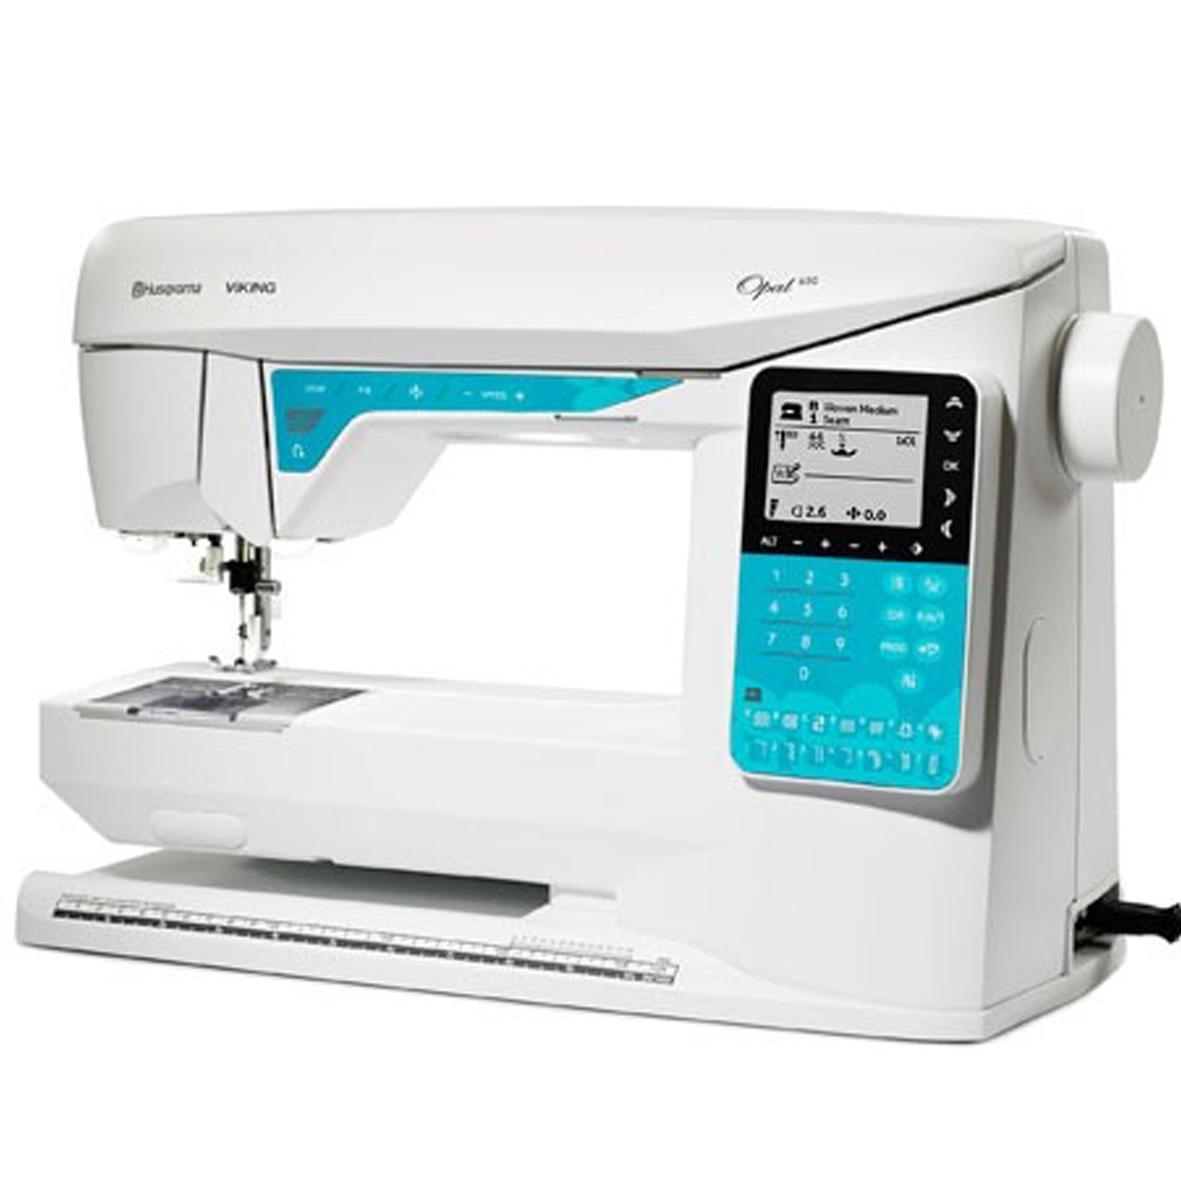 Husqvarna Opal 650 Sewing Machine   Frank Nutt Sewing ...